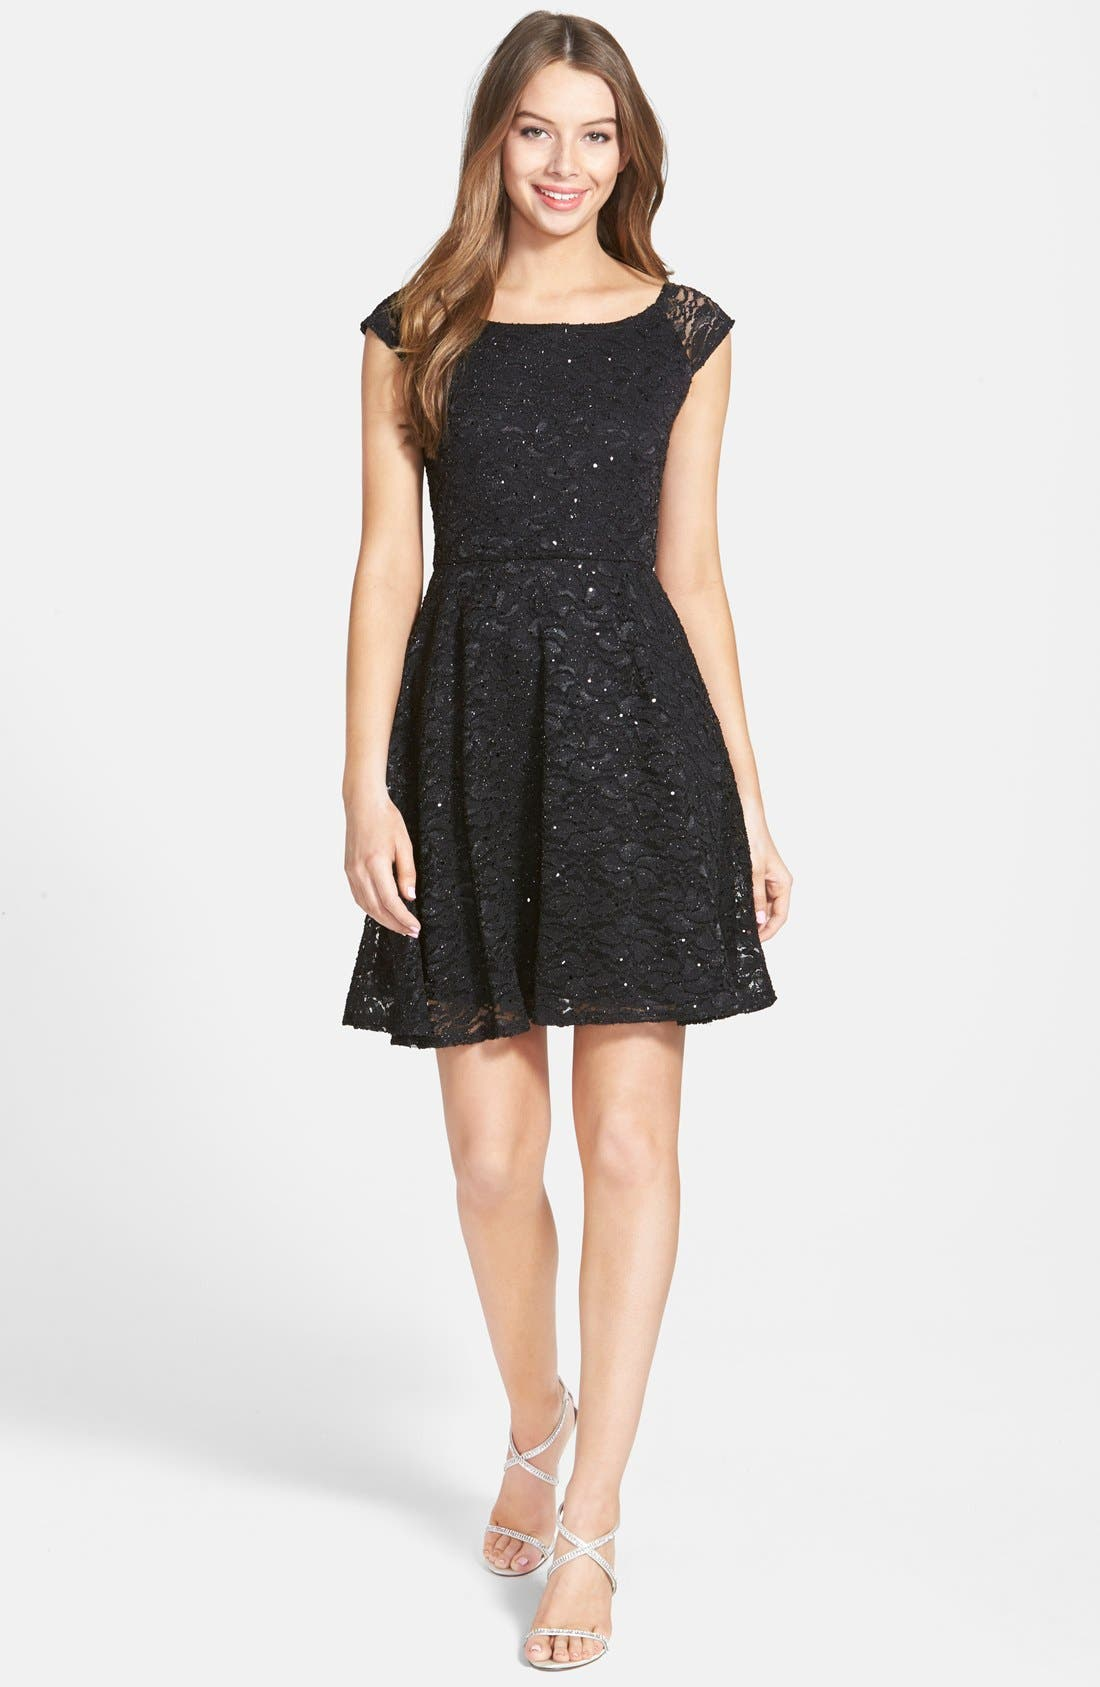 Main Image - Jump Apparel Glitter Lace Cap Sleeve Skater Dress